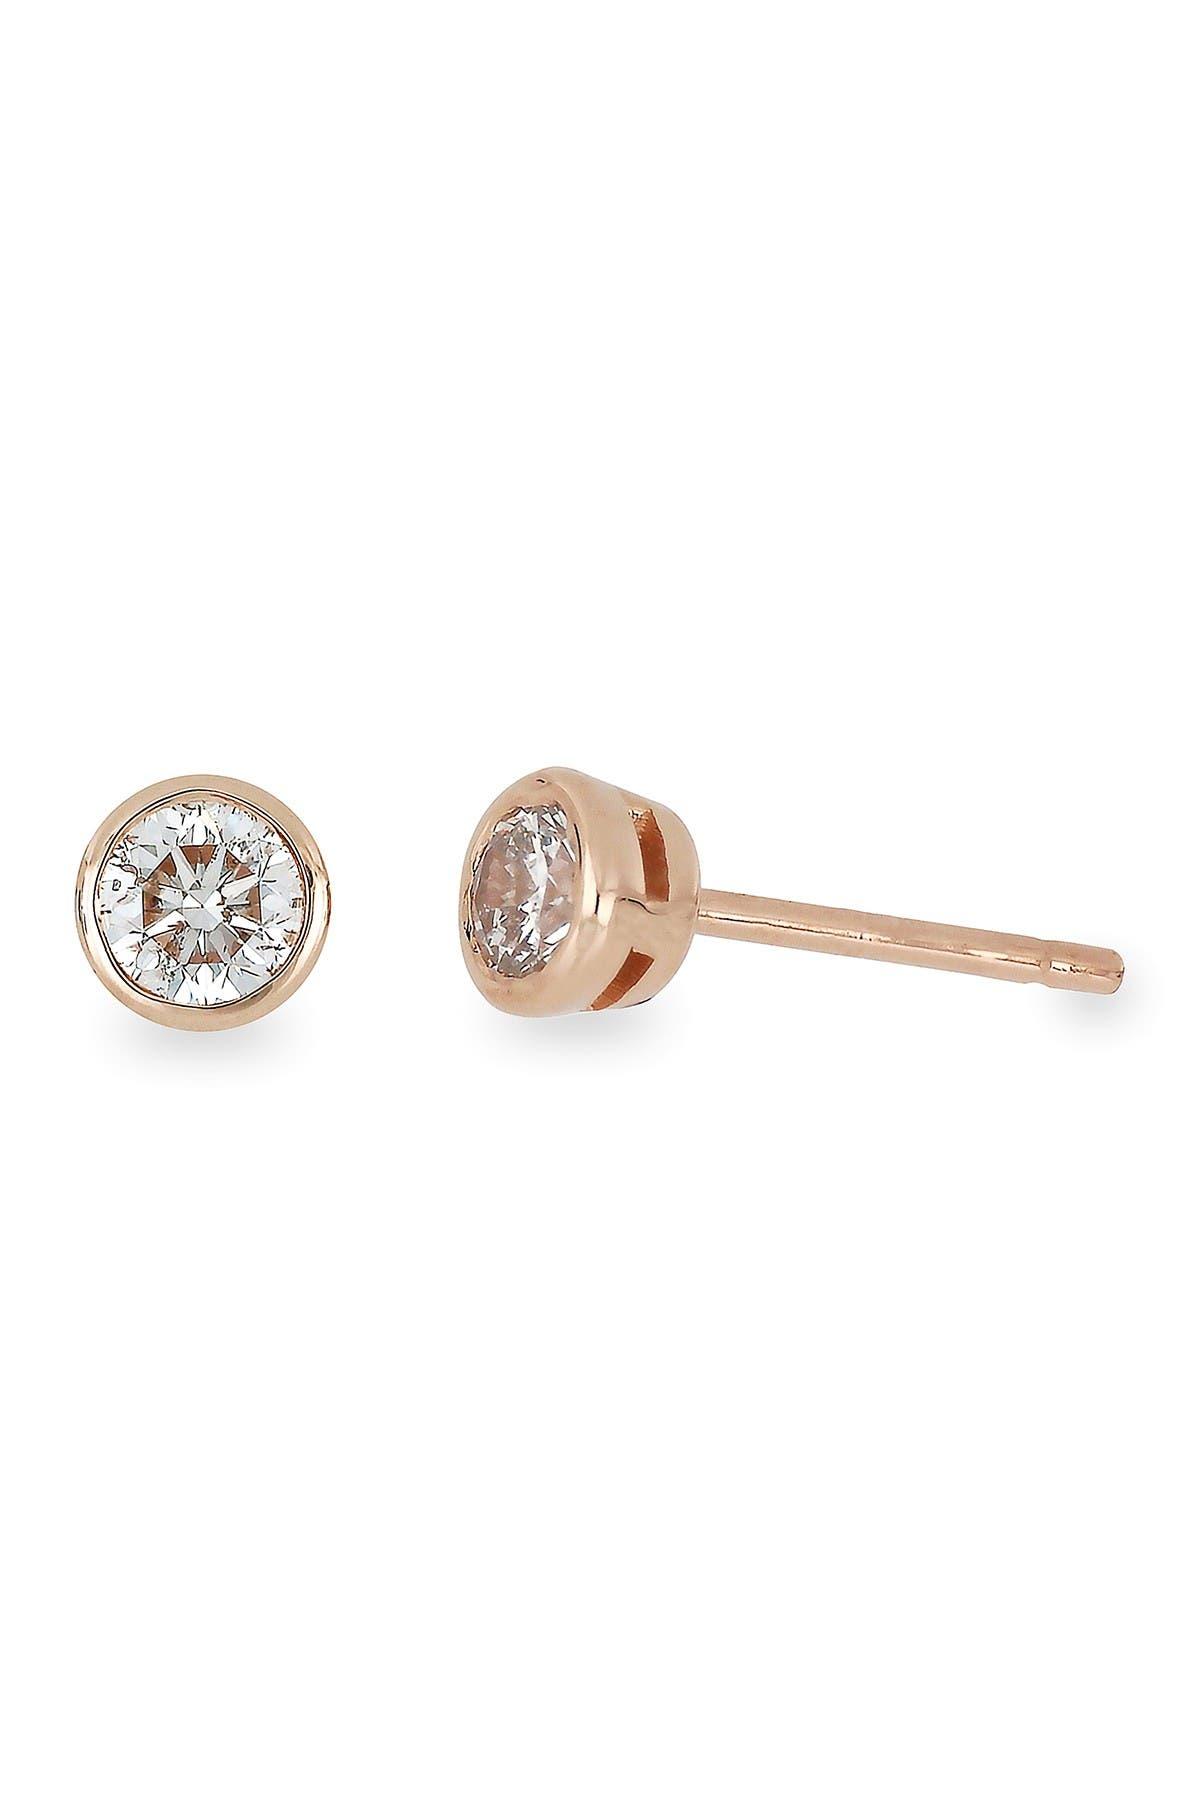 Image of Bony Levy 14K Gold Round-Cut Diamond Stud Earrings - 0.15 ctw